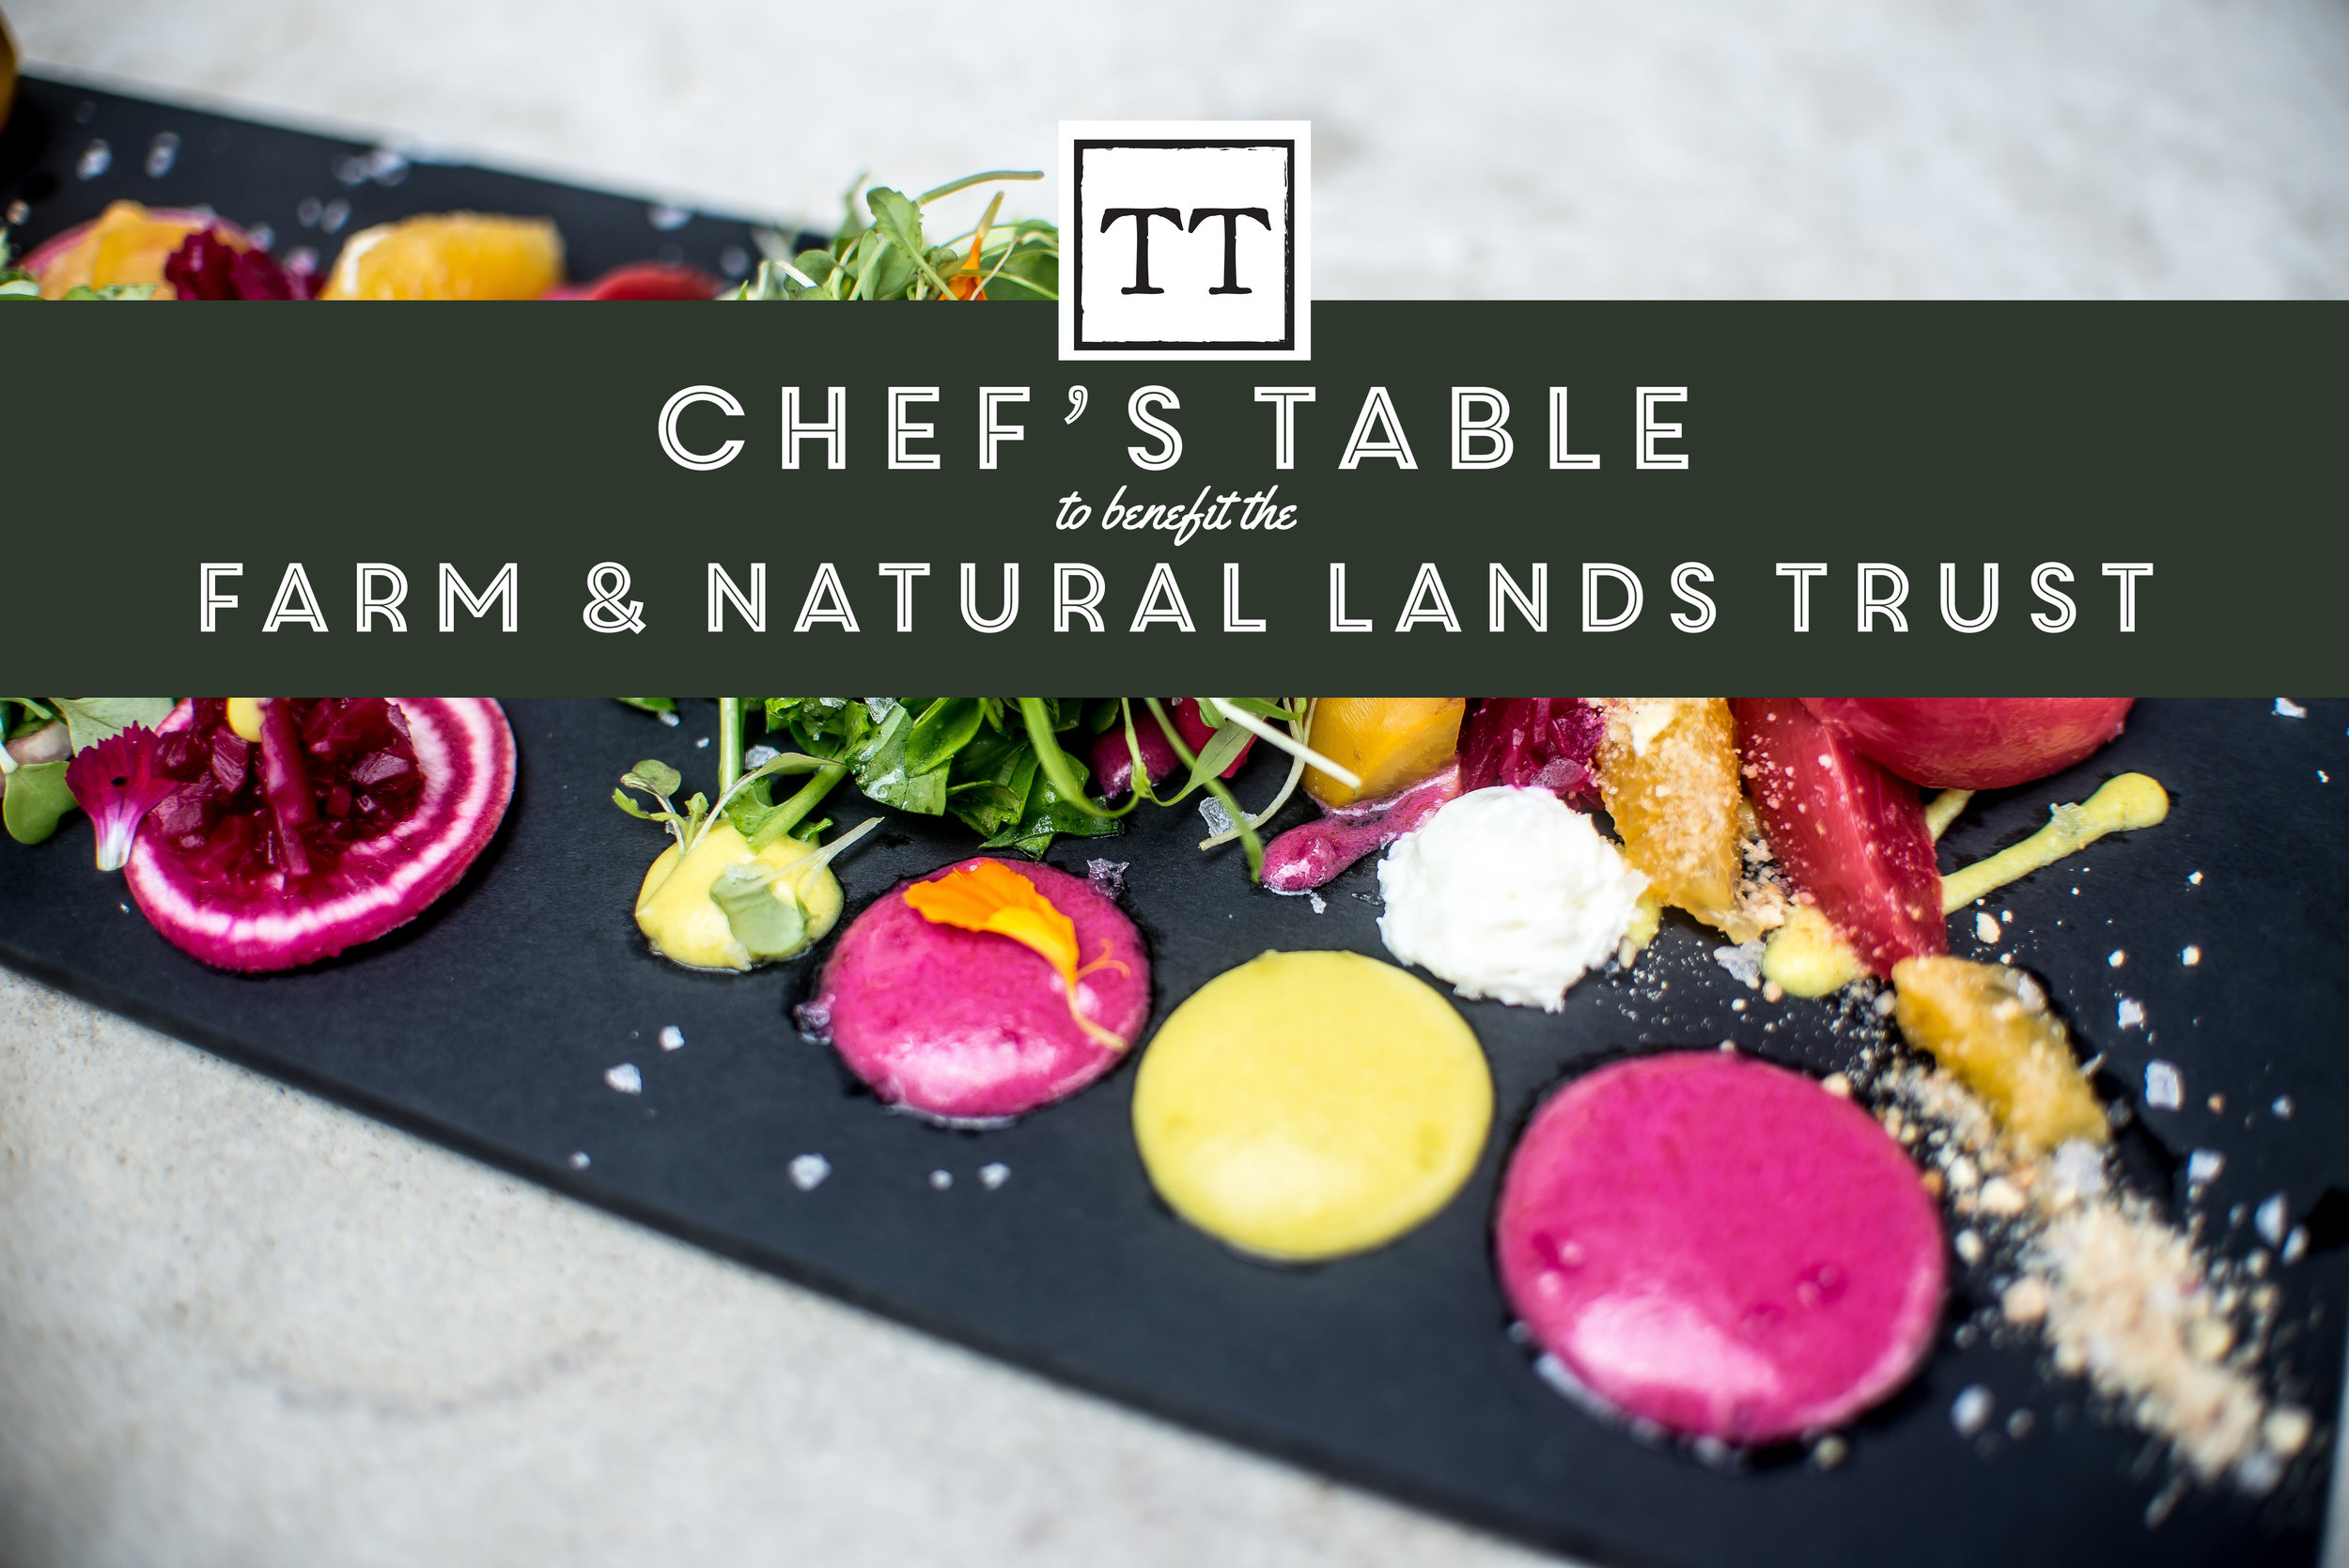 fnlt chefs table.jpg